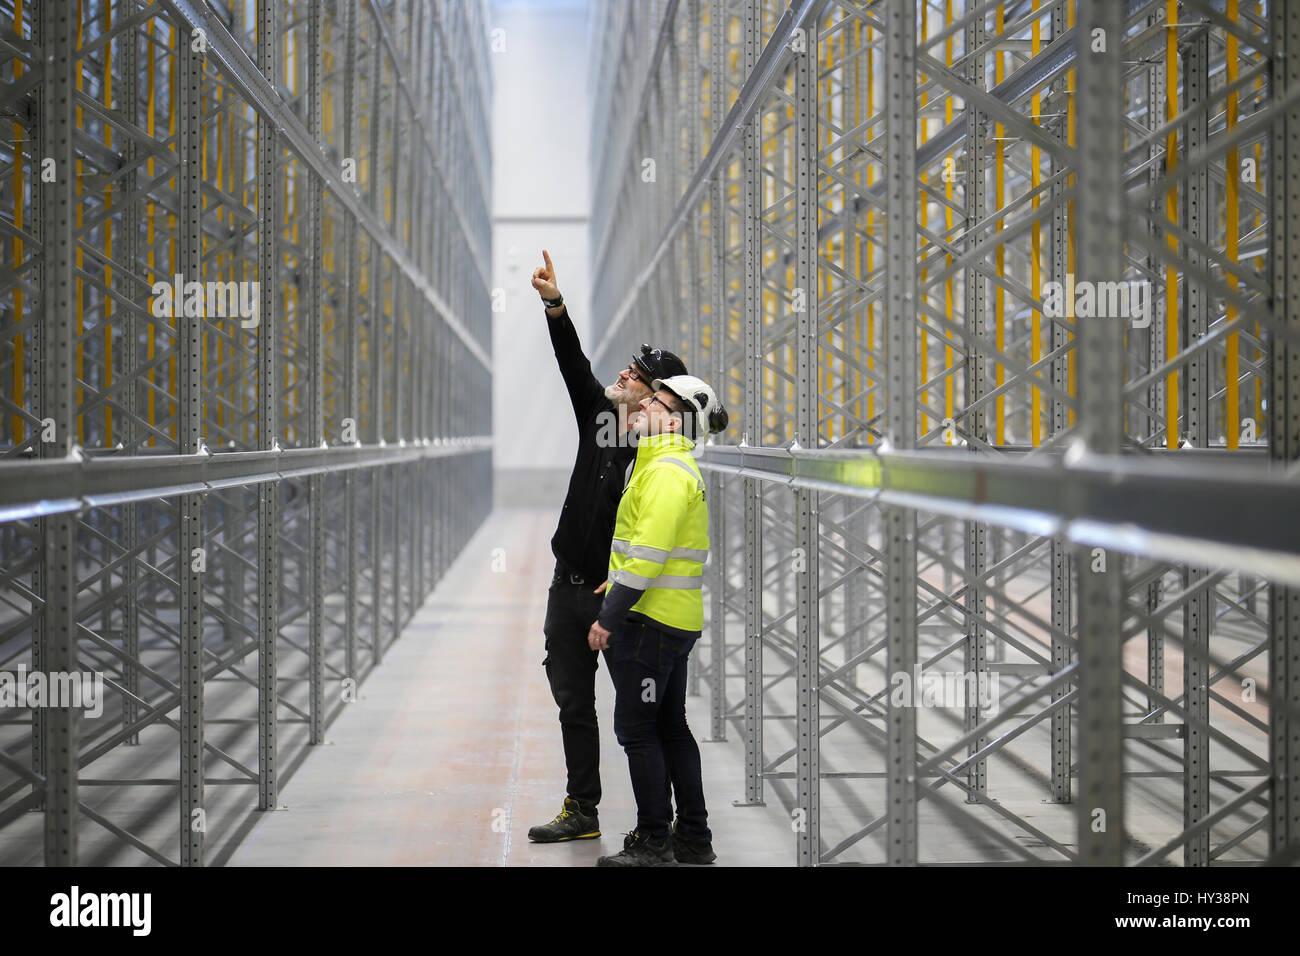 Sweden, Mature men at construction site - Stock Image